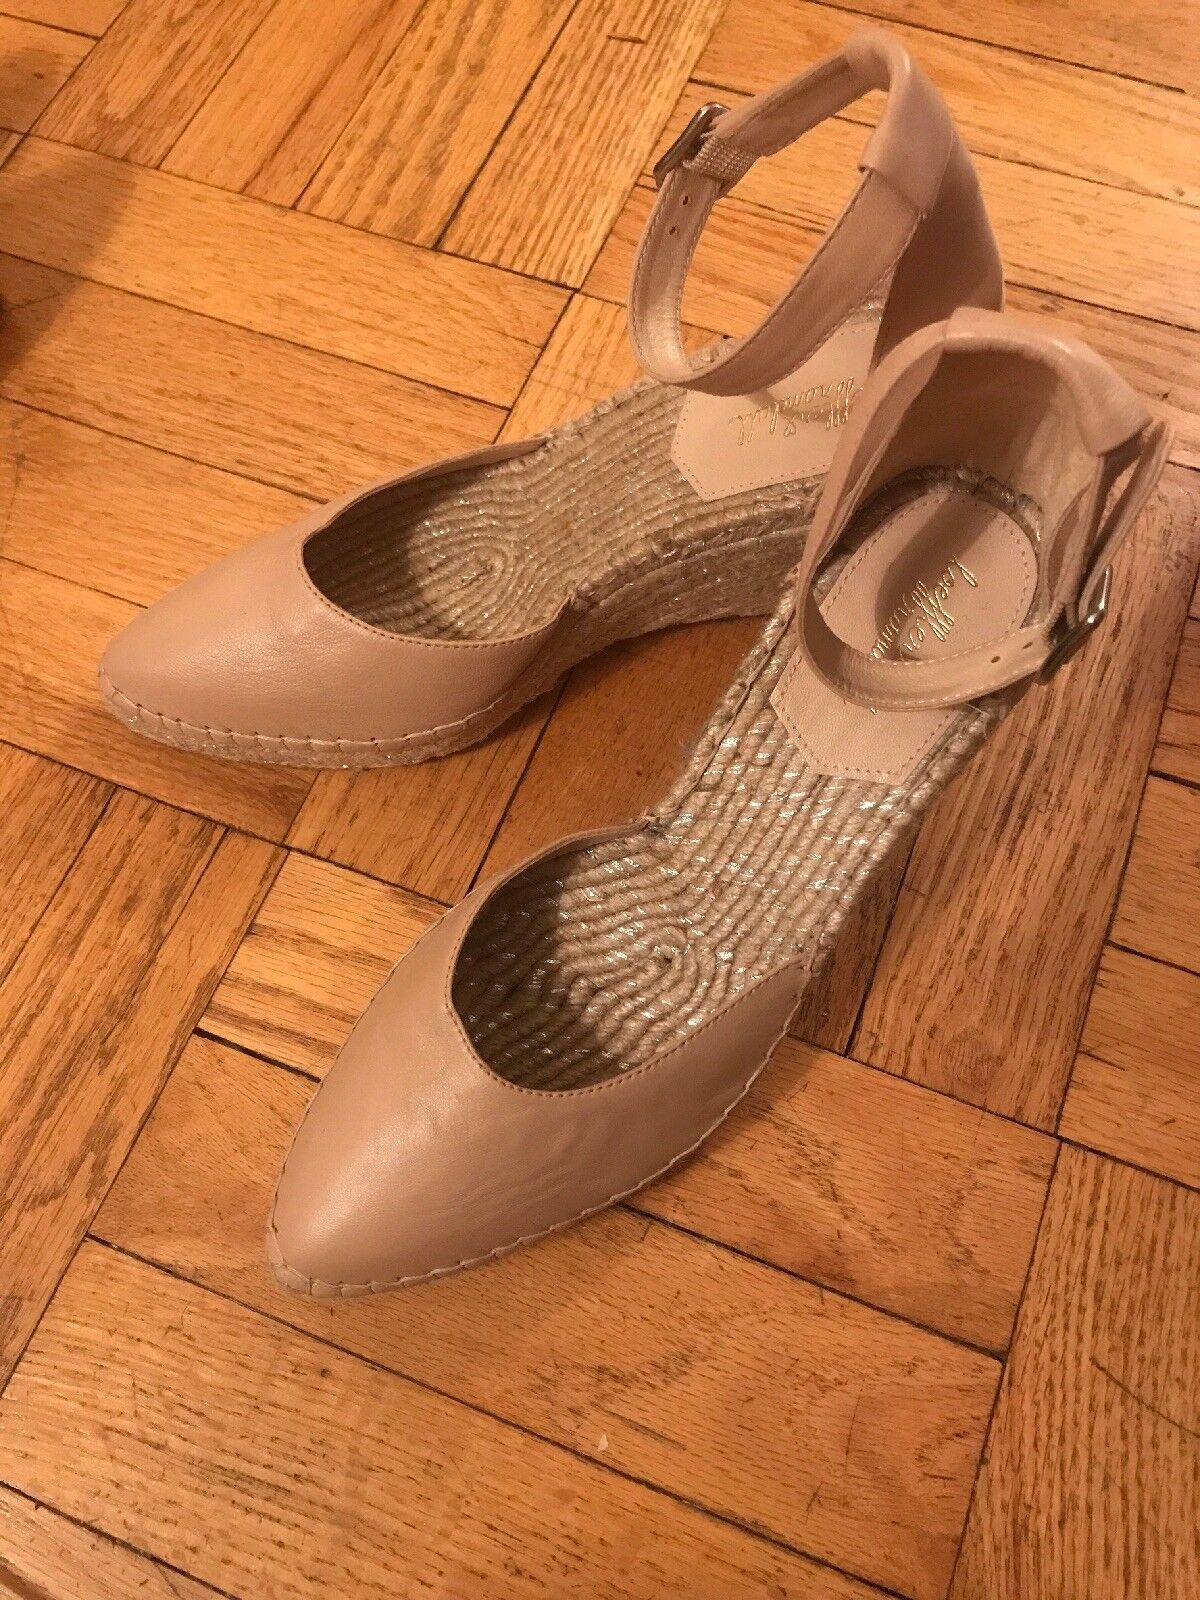 Loeffler Randall Sz 9 Milly Beige Blaush leather Ankle Buckle Wedge Espadrilles